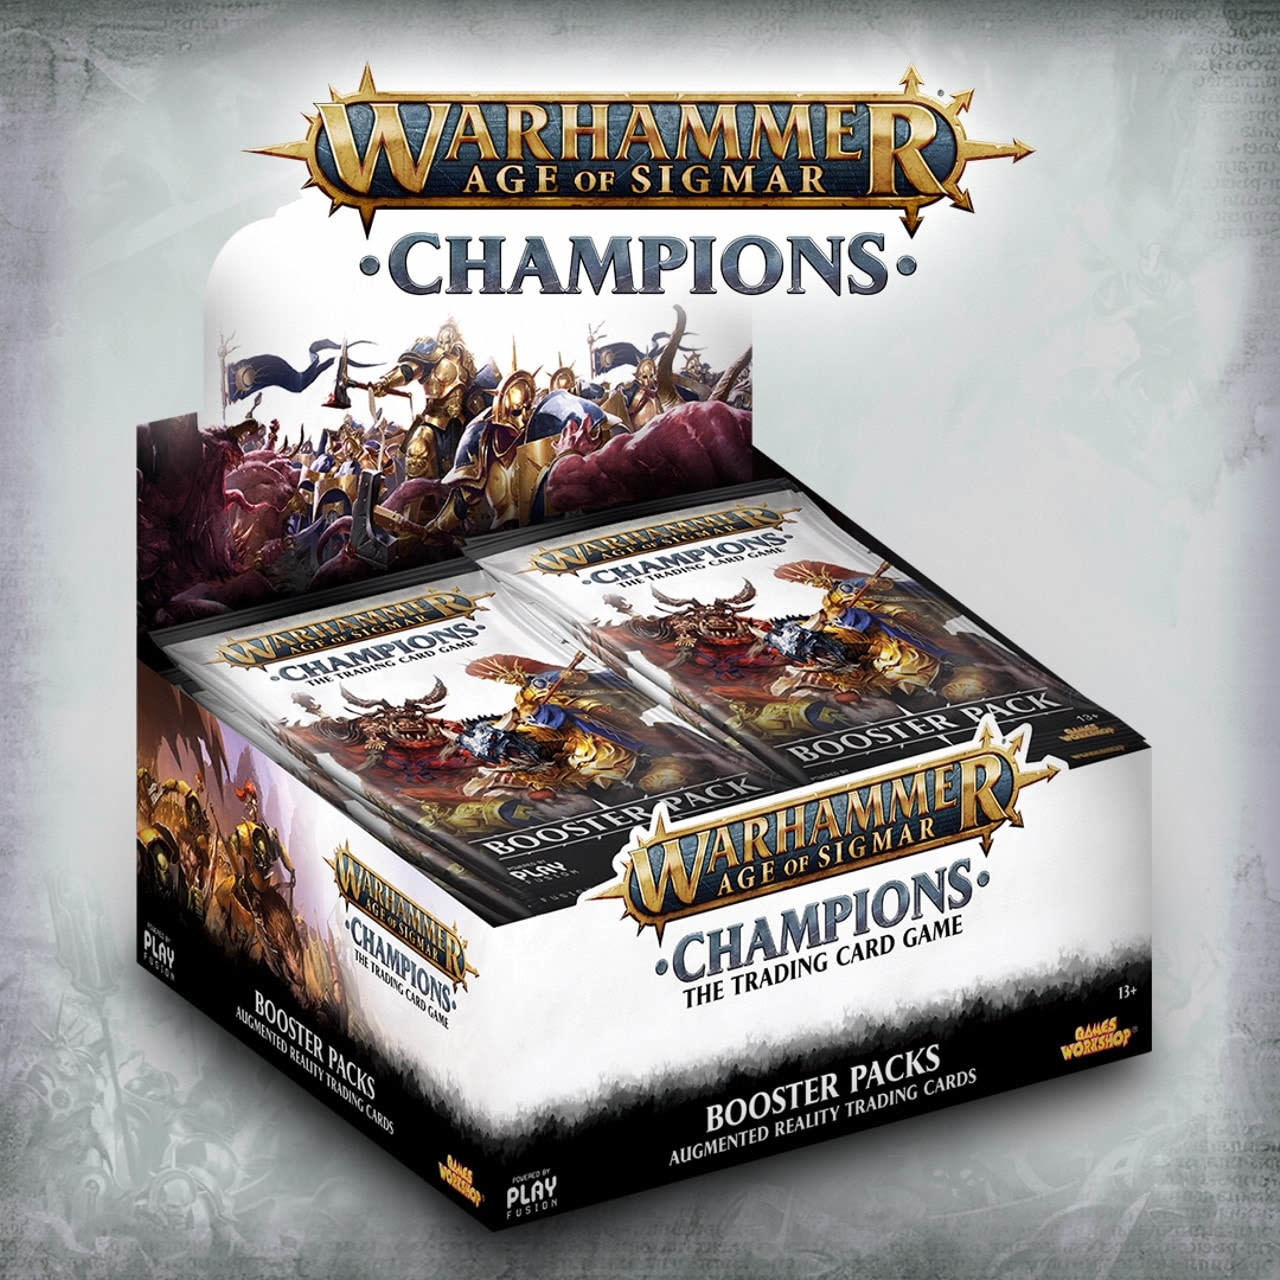 Games Workshop Warhammer CCG Chapions booster